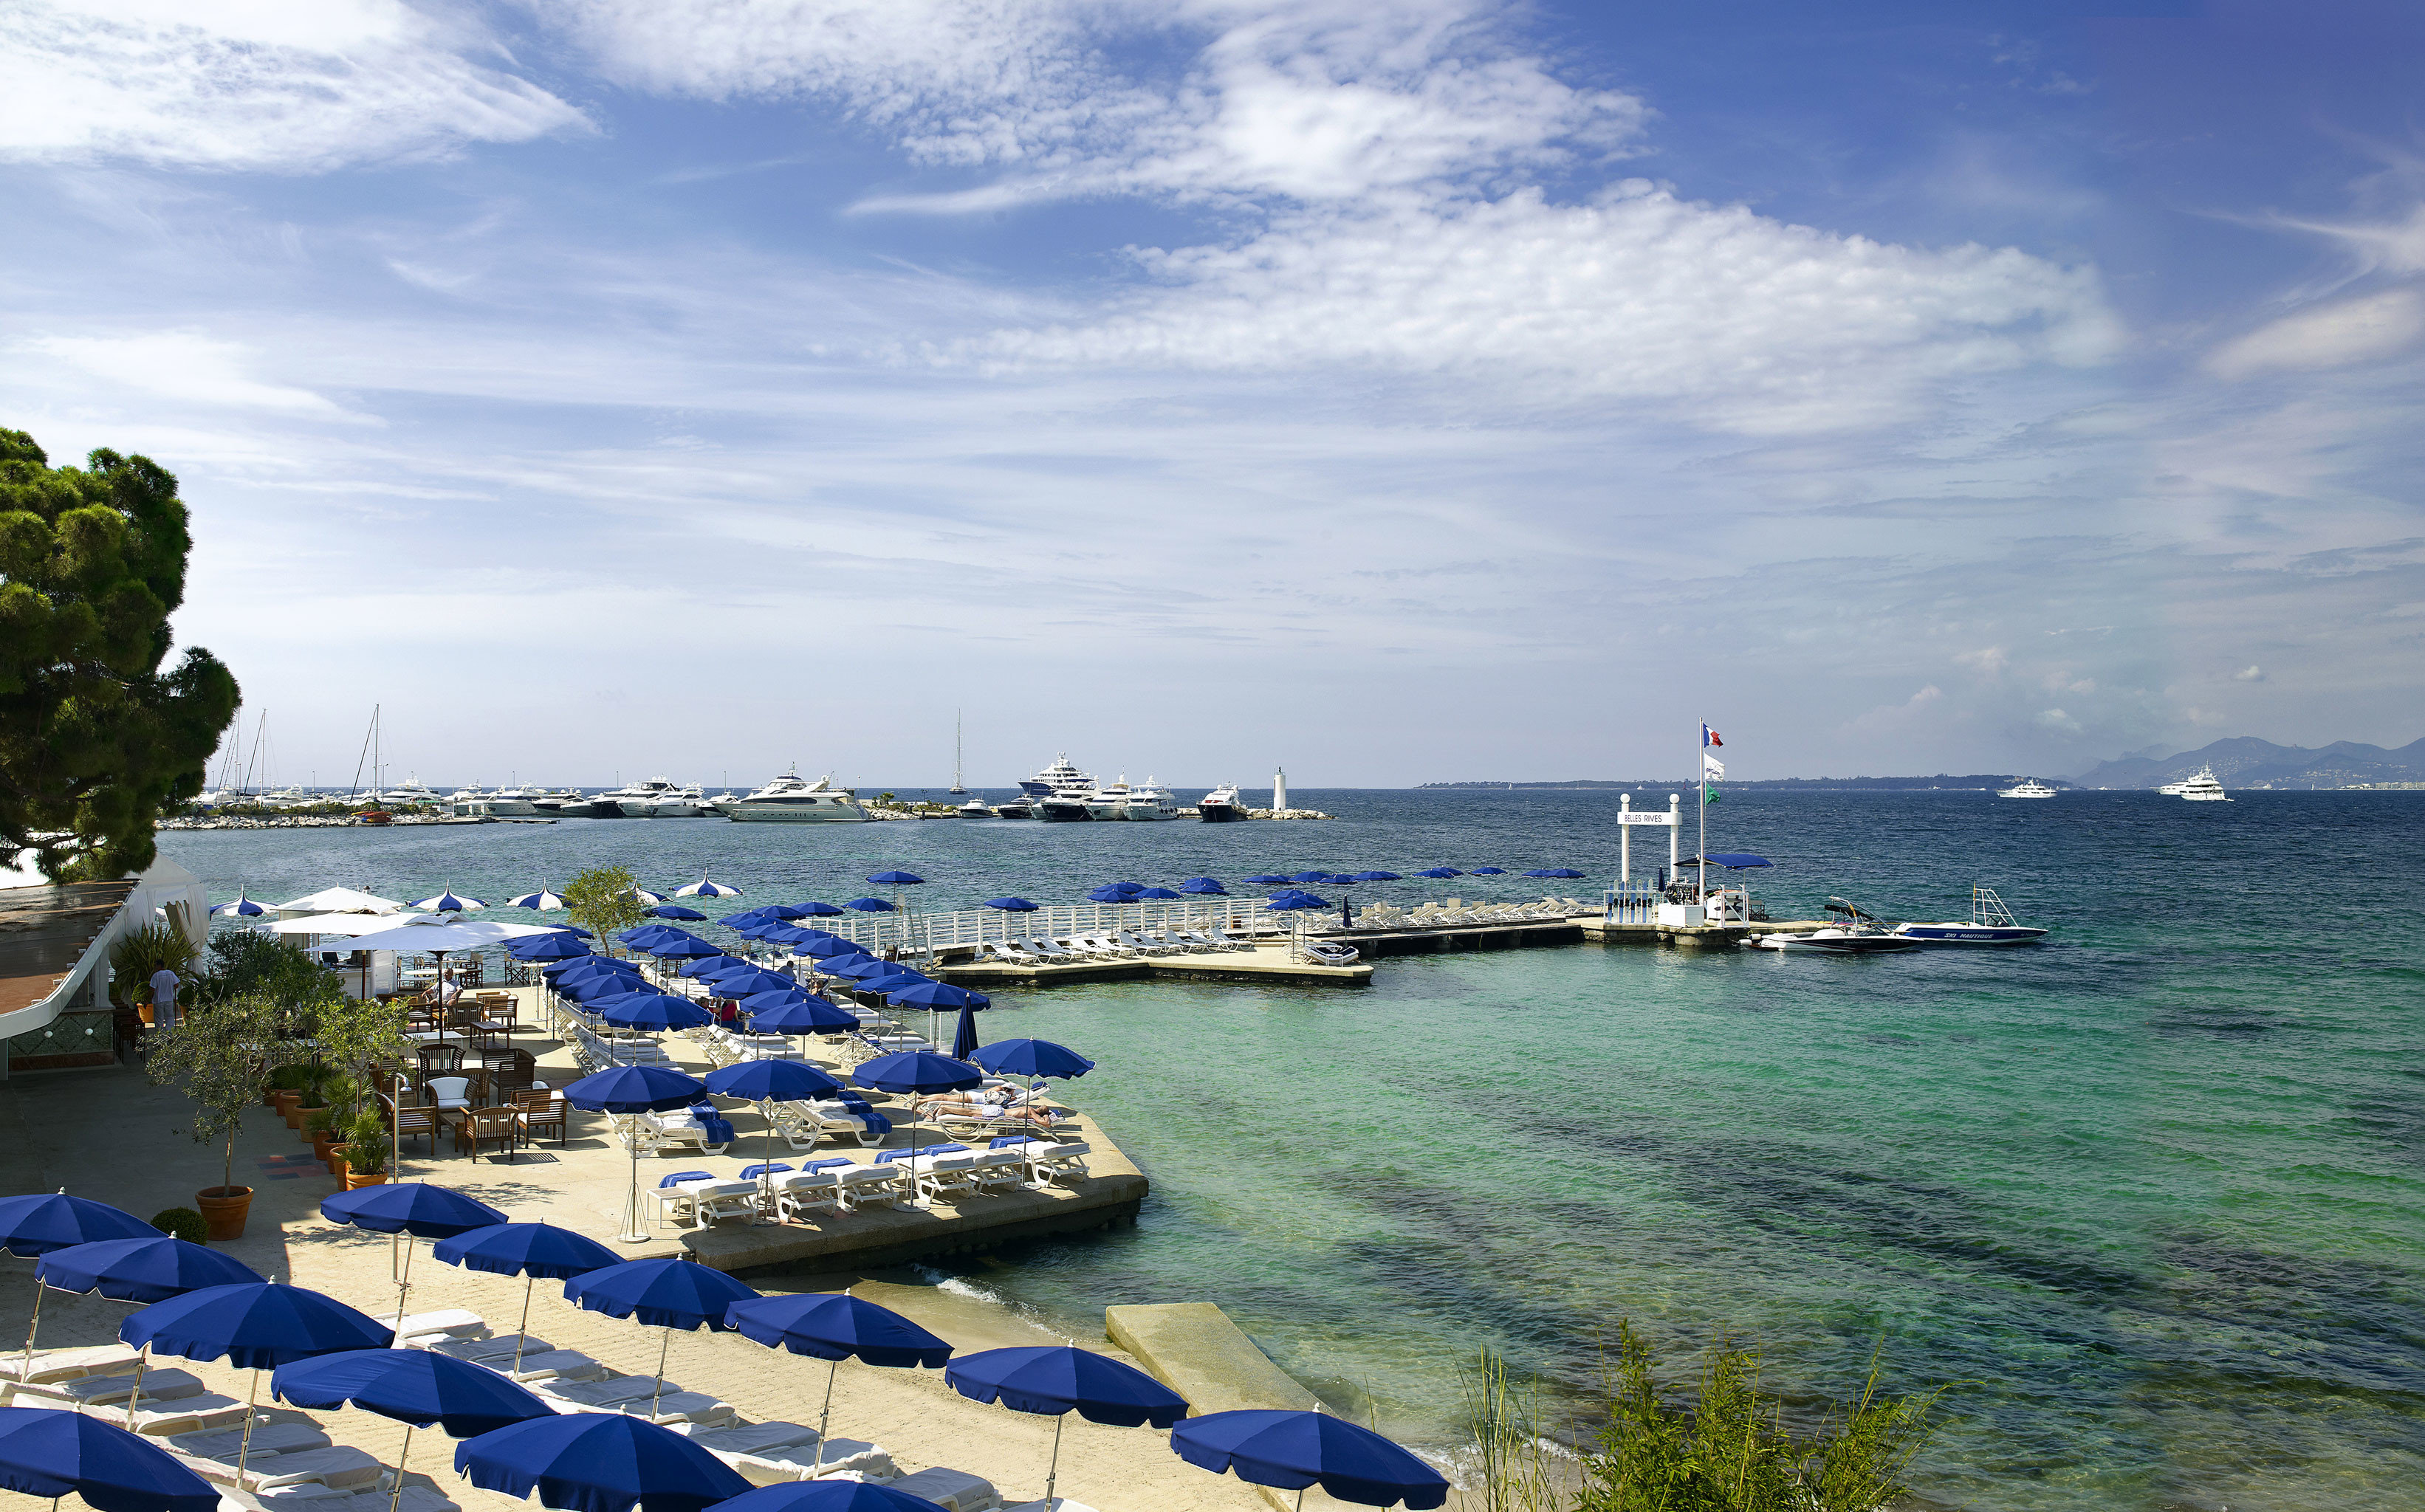 Beach Beachfront Play Scenic views sky water Sea marina vehicle Ocean Coast shore dock Harbor Resort day